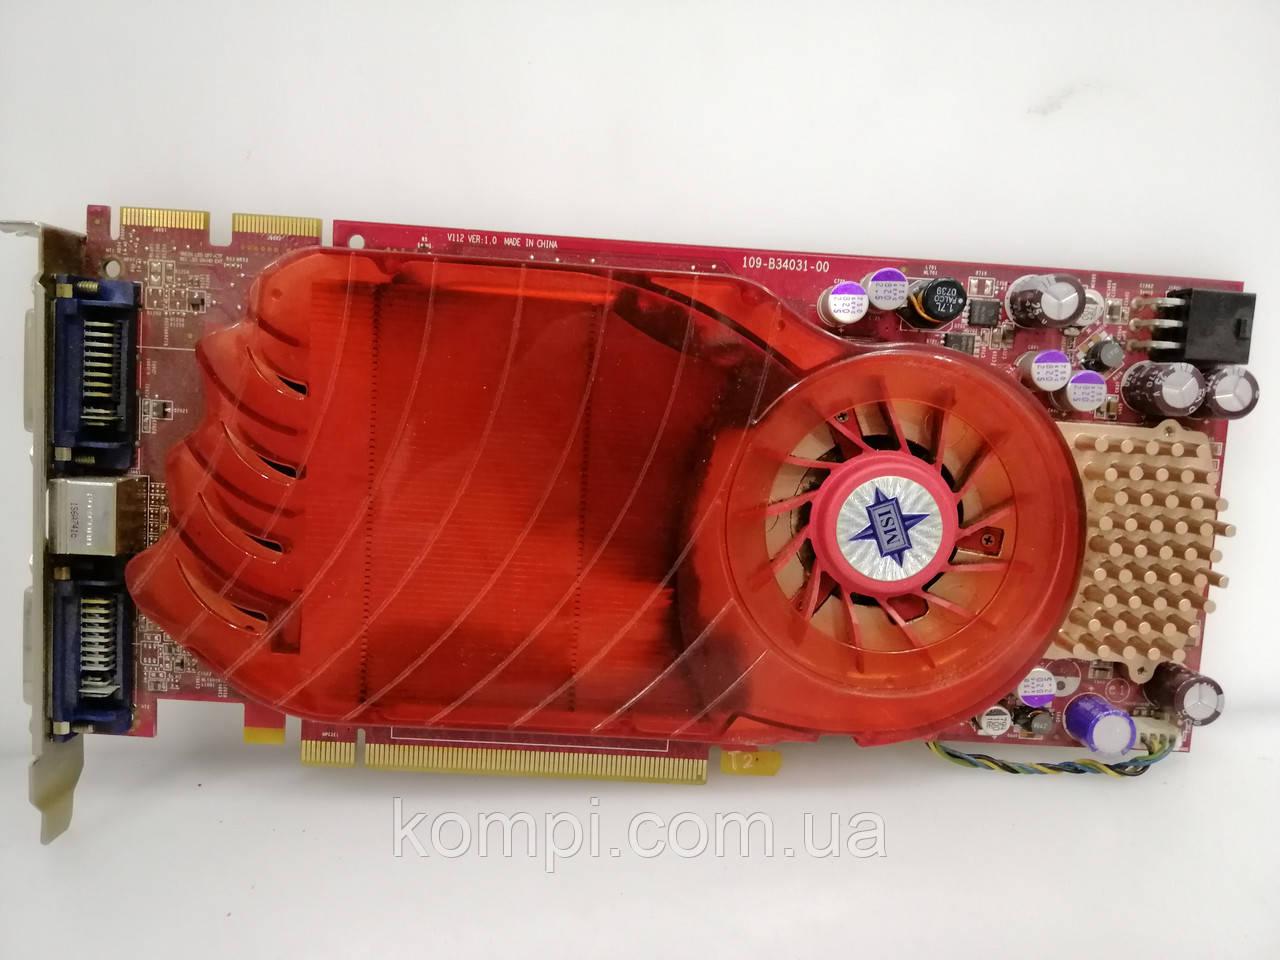 Видеокарта ATI Radeon HD 3850 512mb 256bit PCI-e